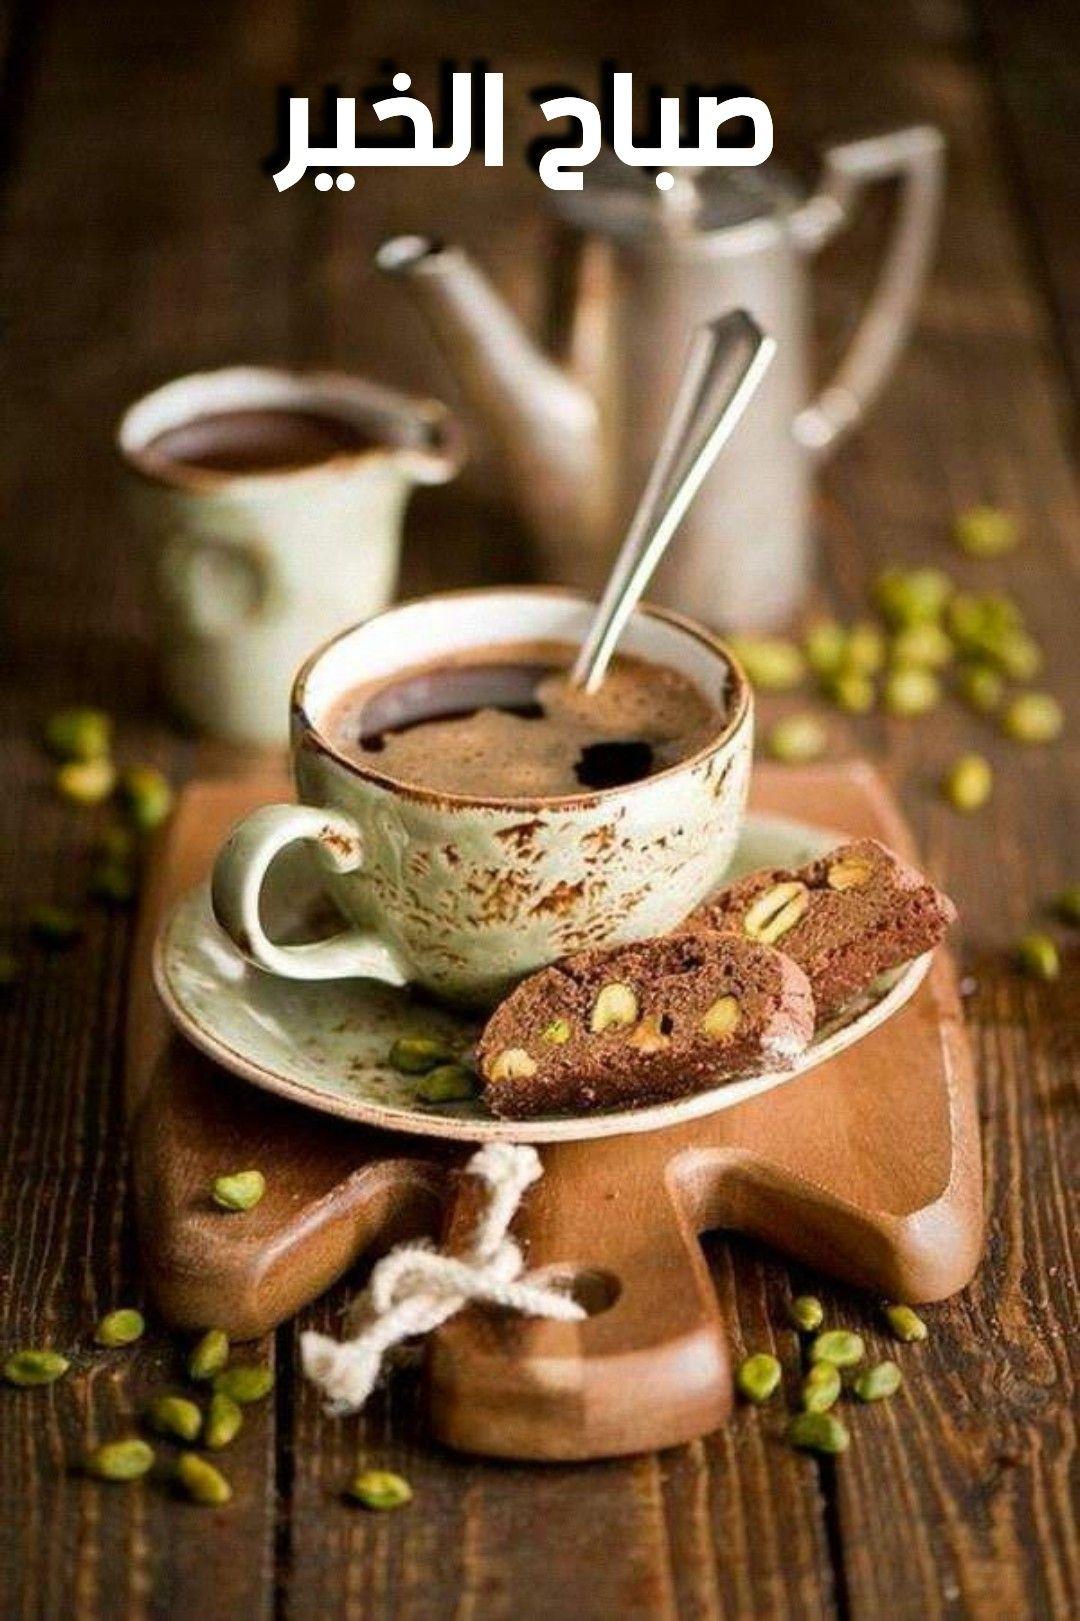 Pin By Dokon دخون On تصاميم لأم حوراء Coffee Cookies Coffee Cups Diy Food